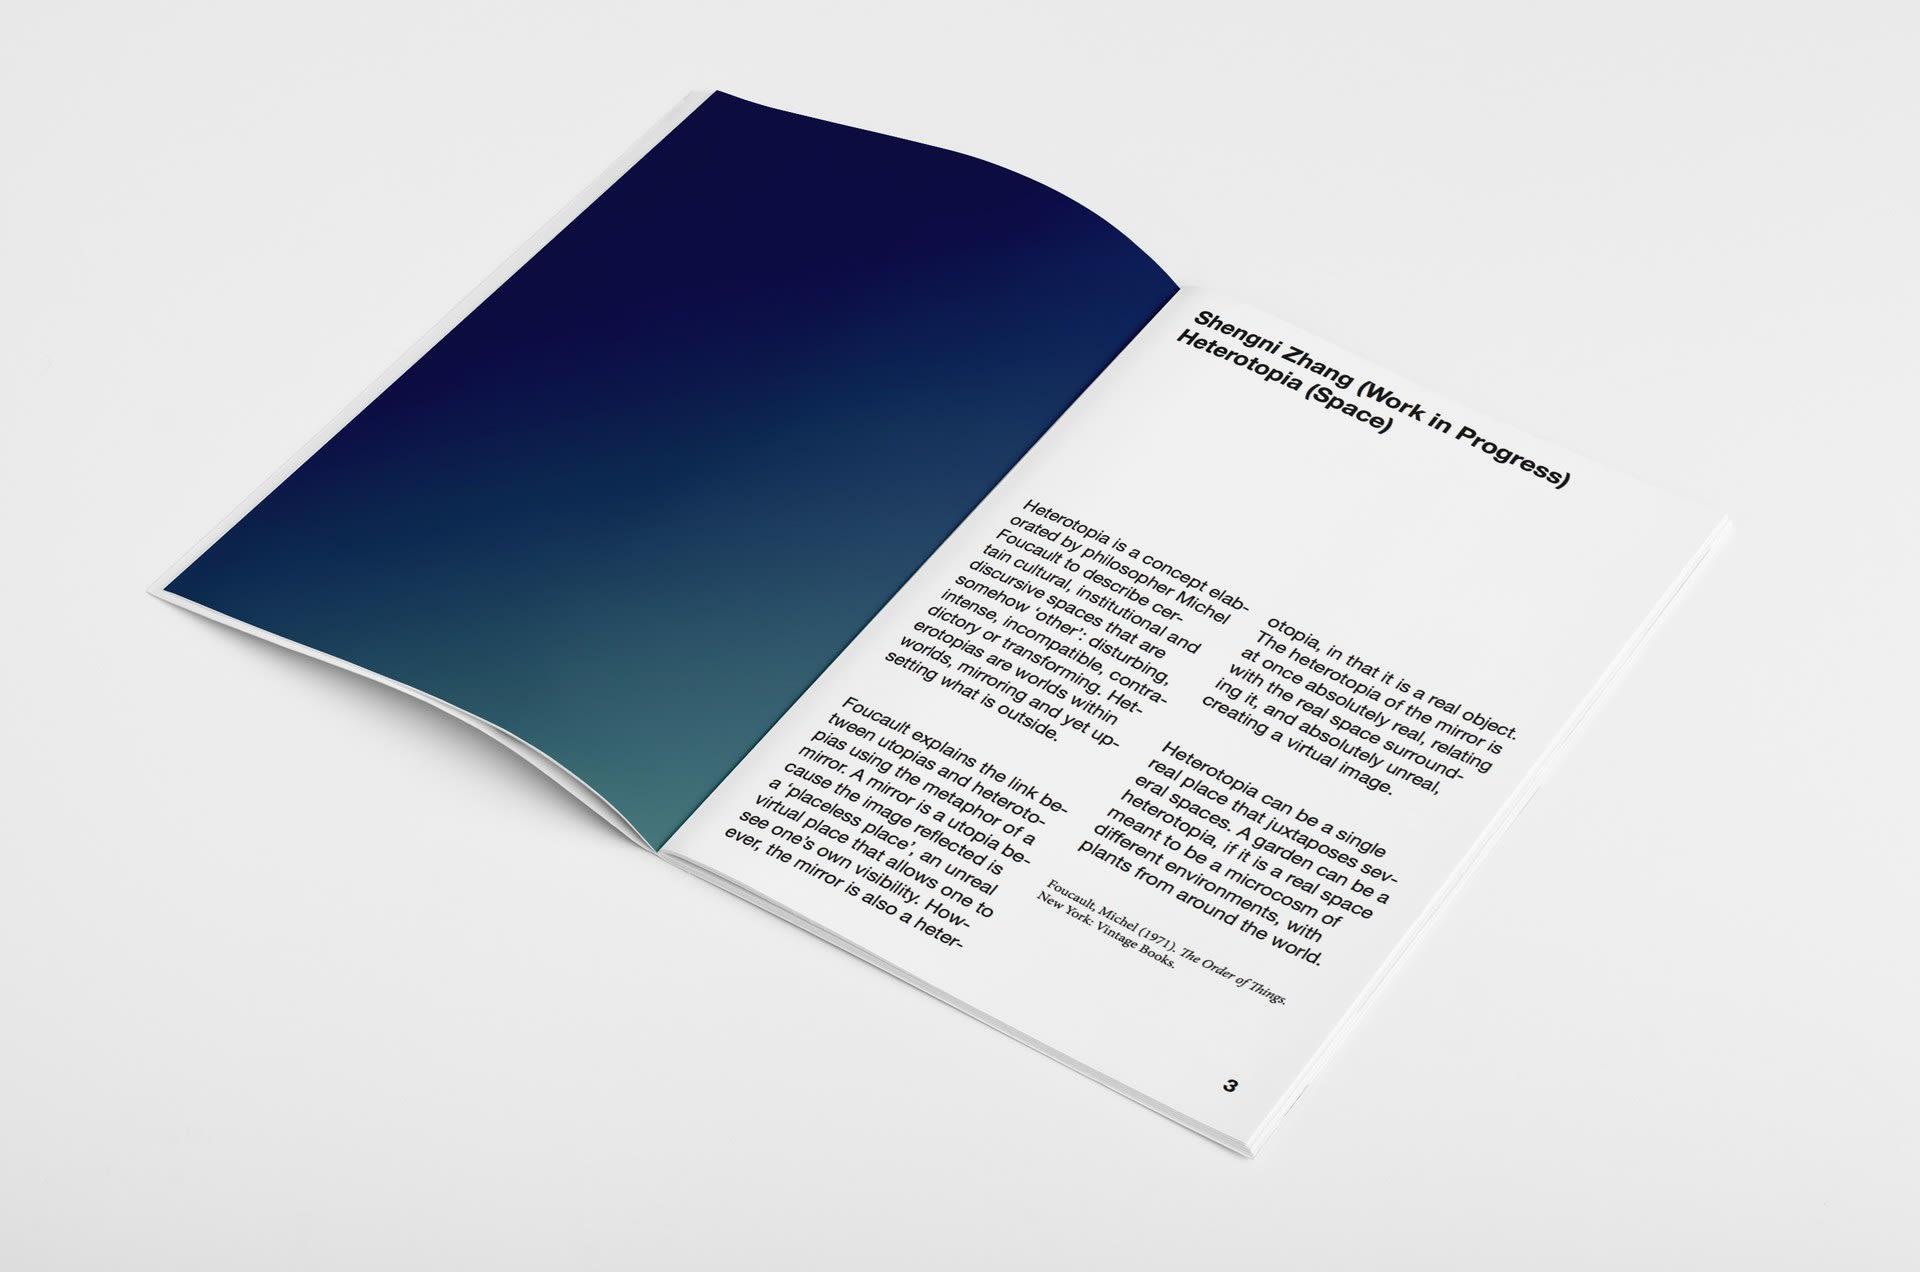 heterotopia research book1